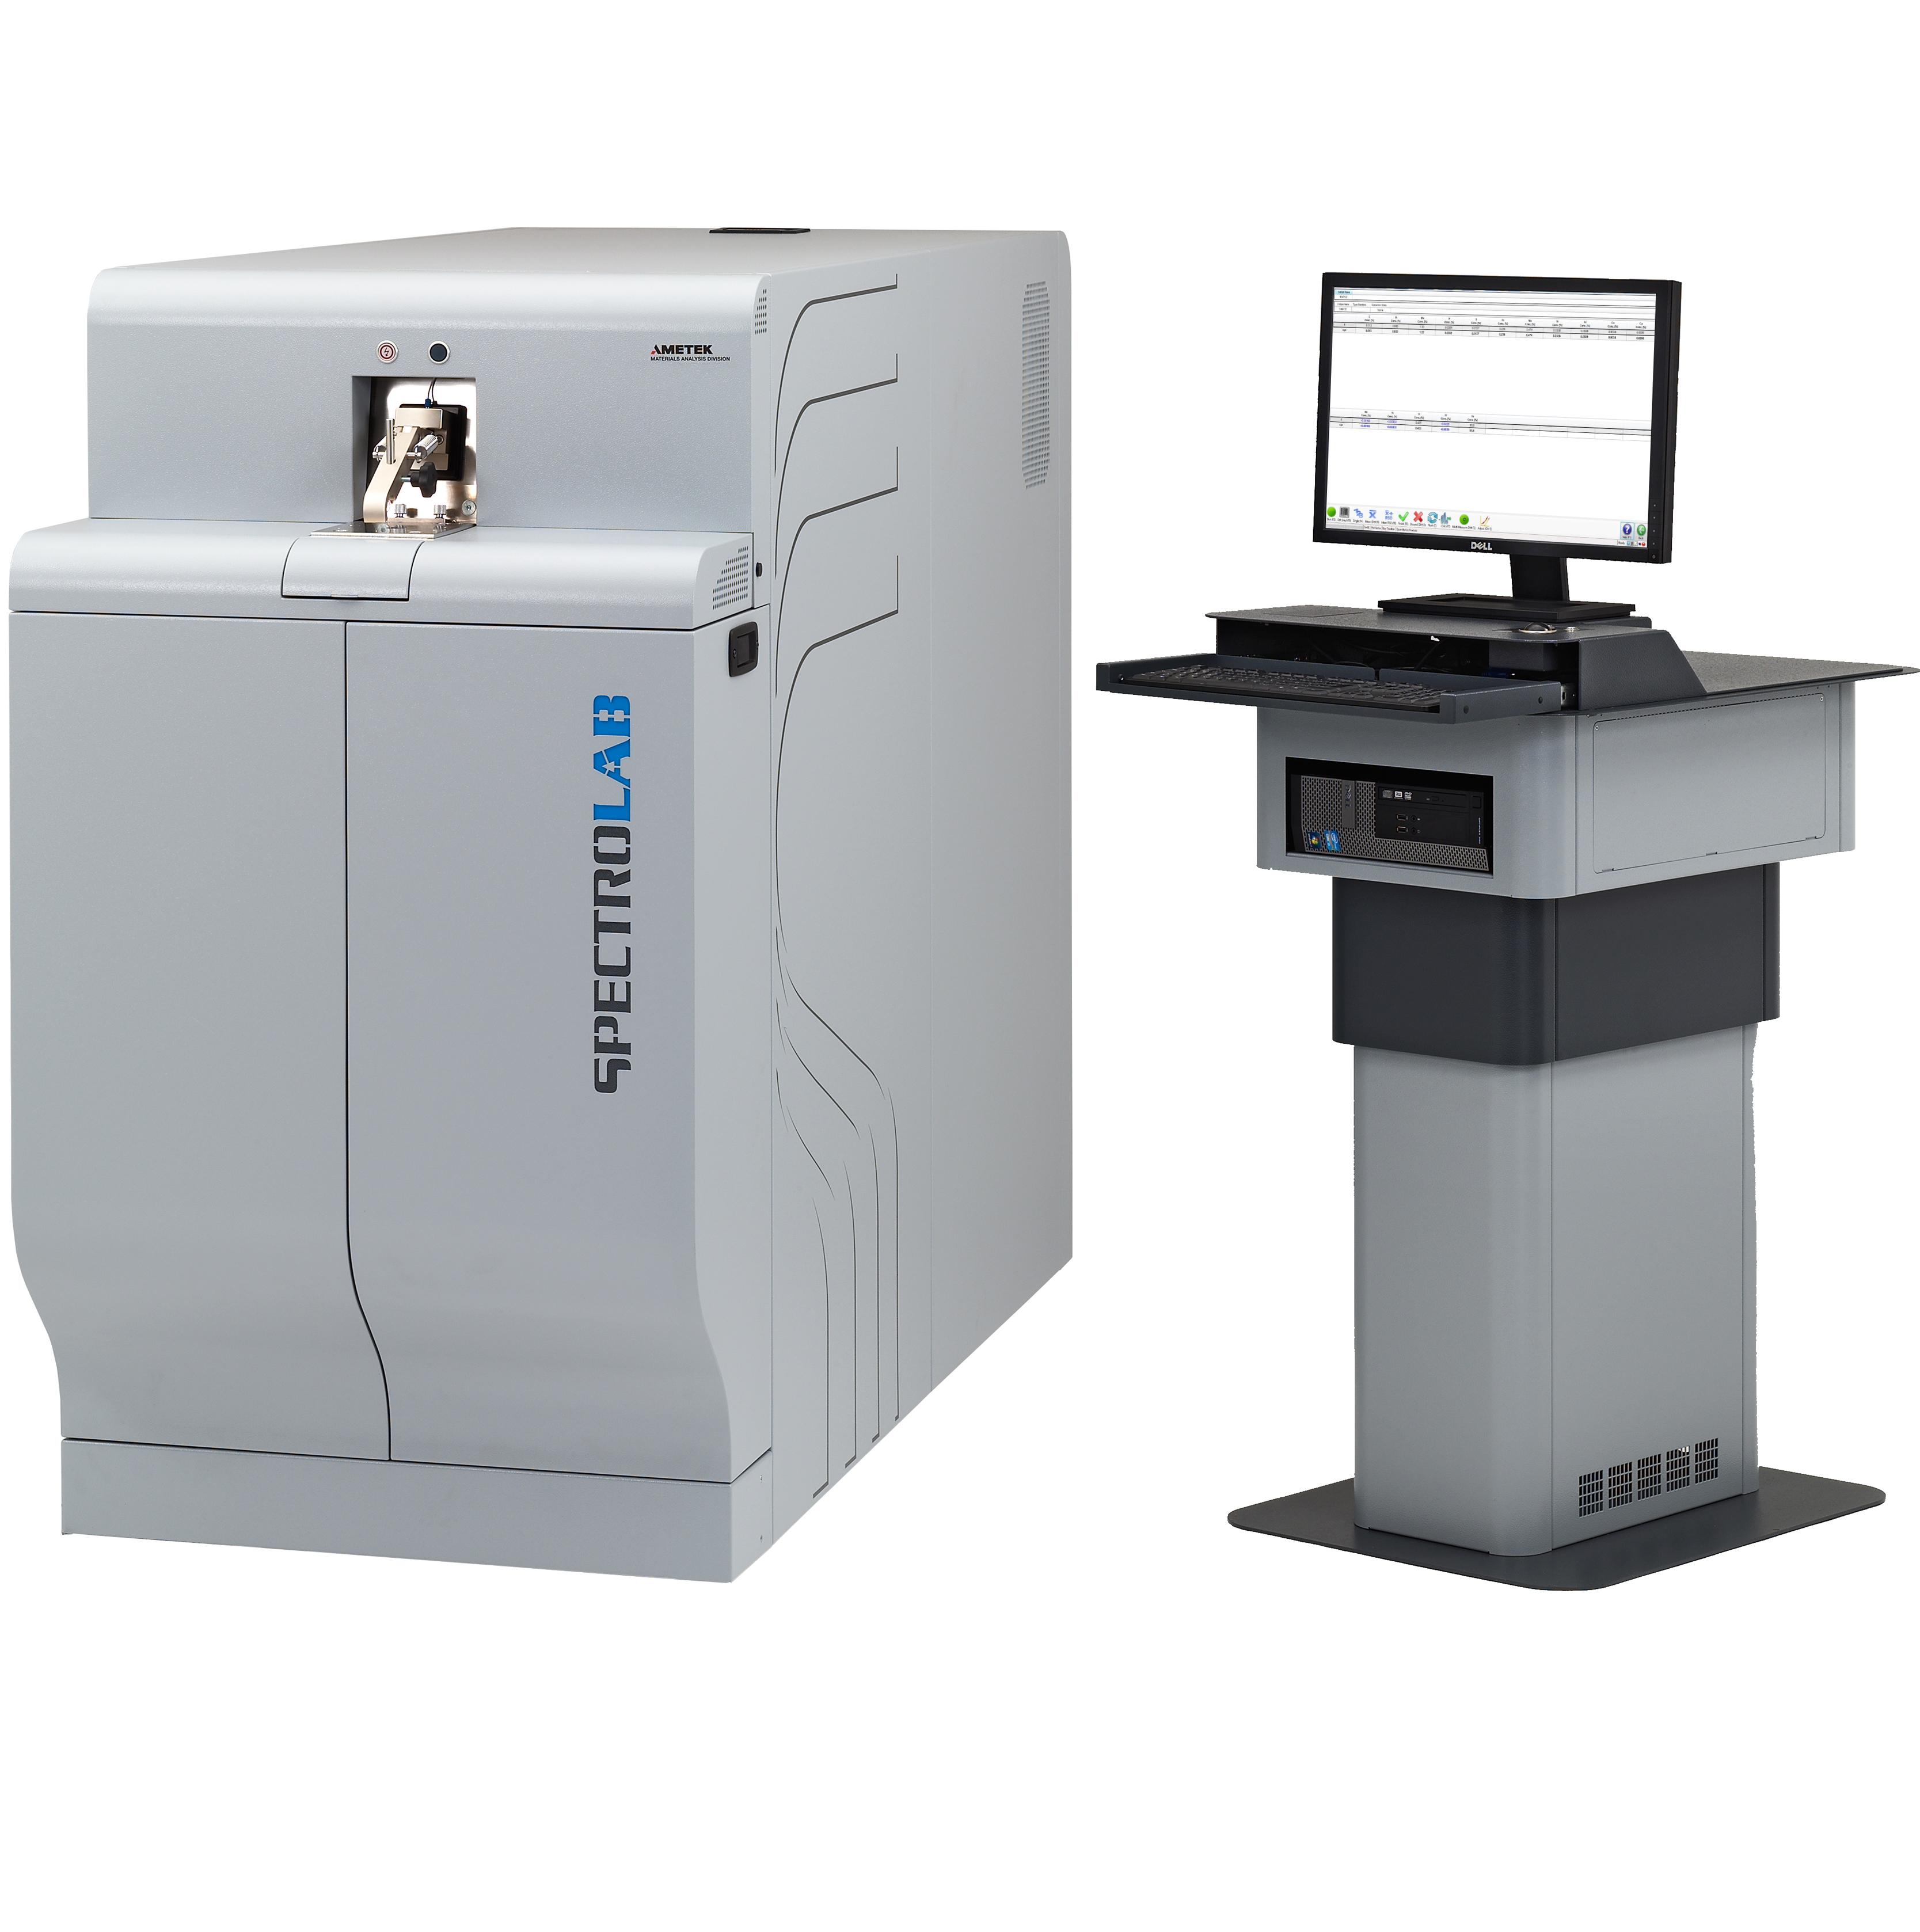 Espectrómetro Spectrolab